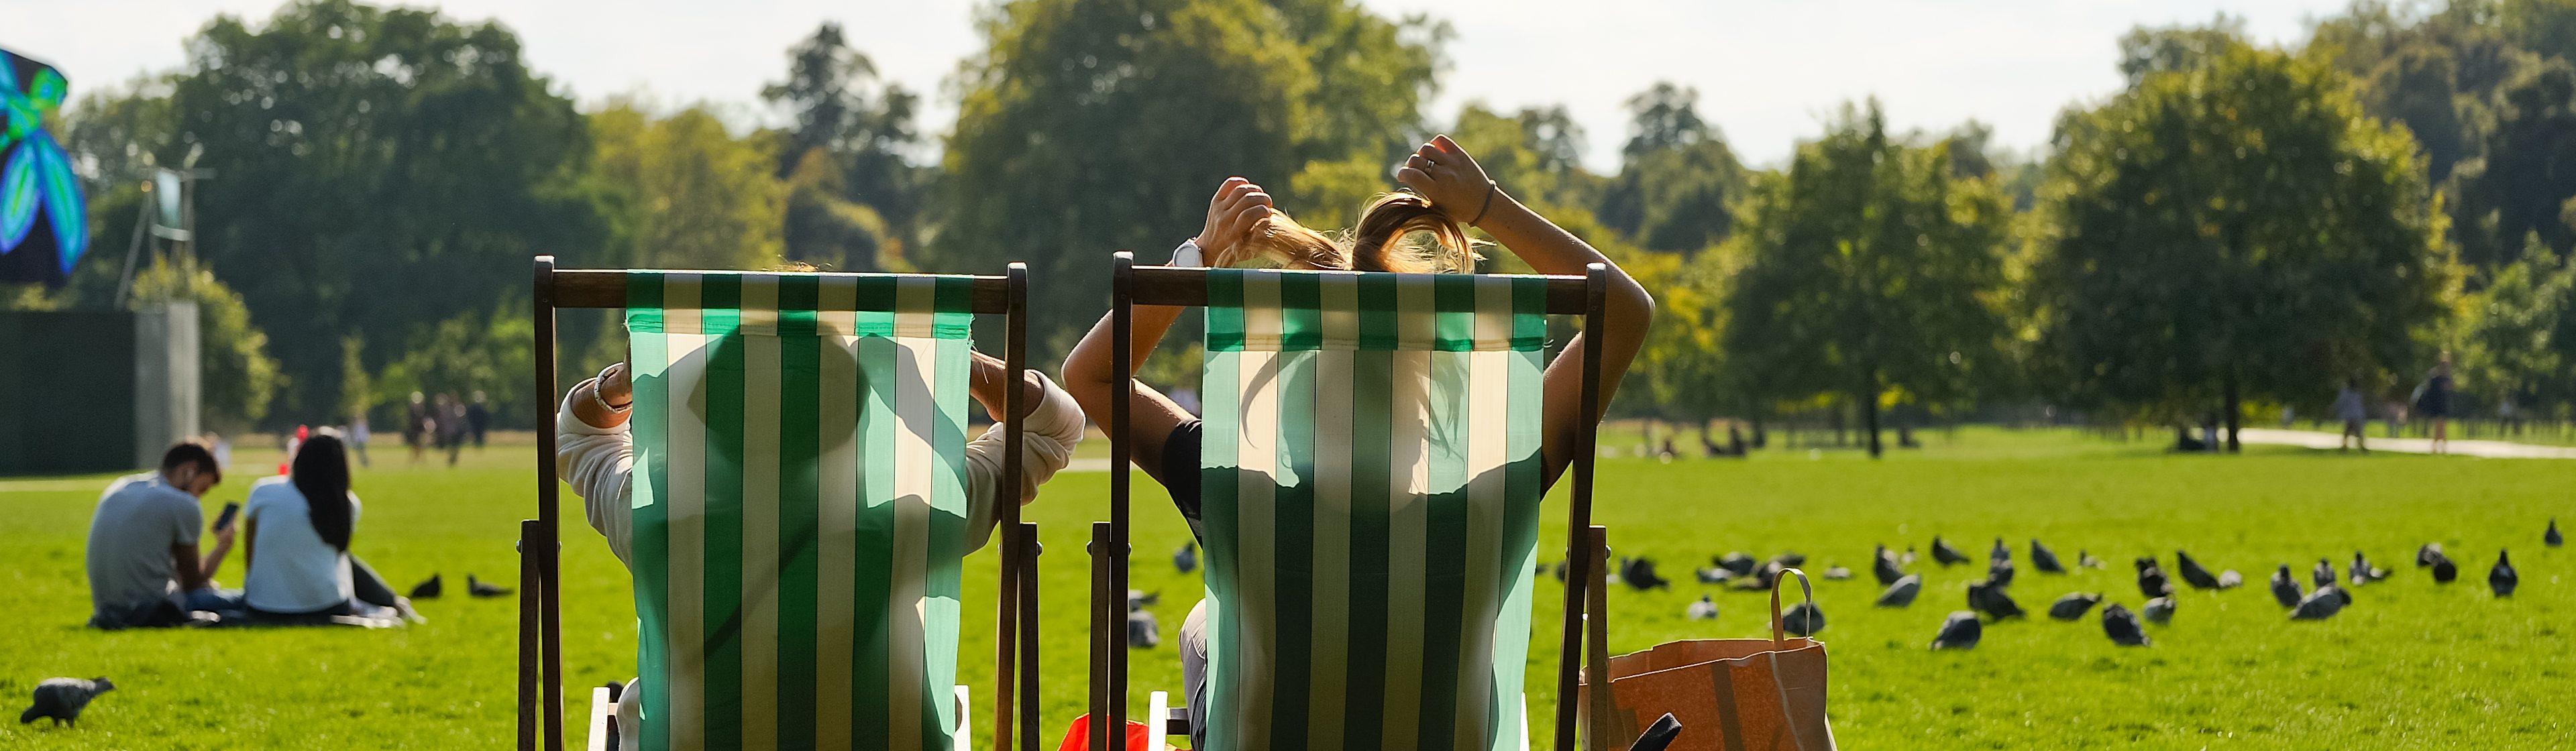 London picnic